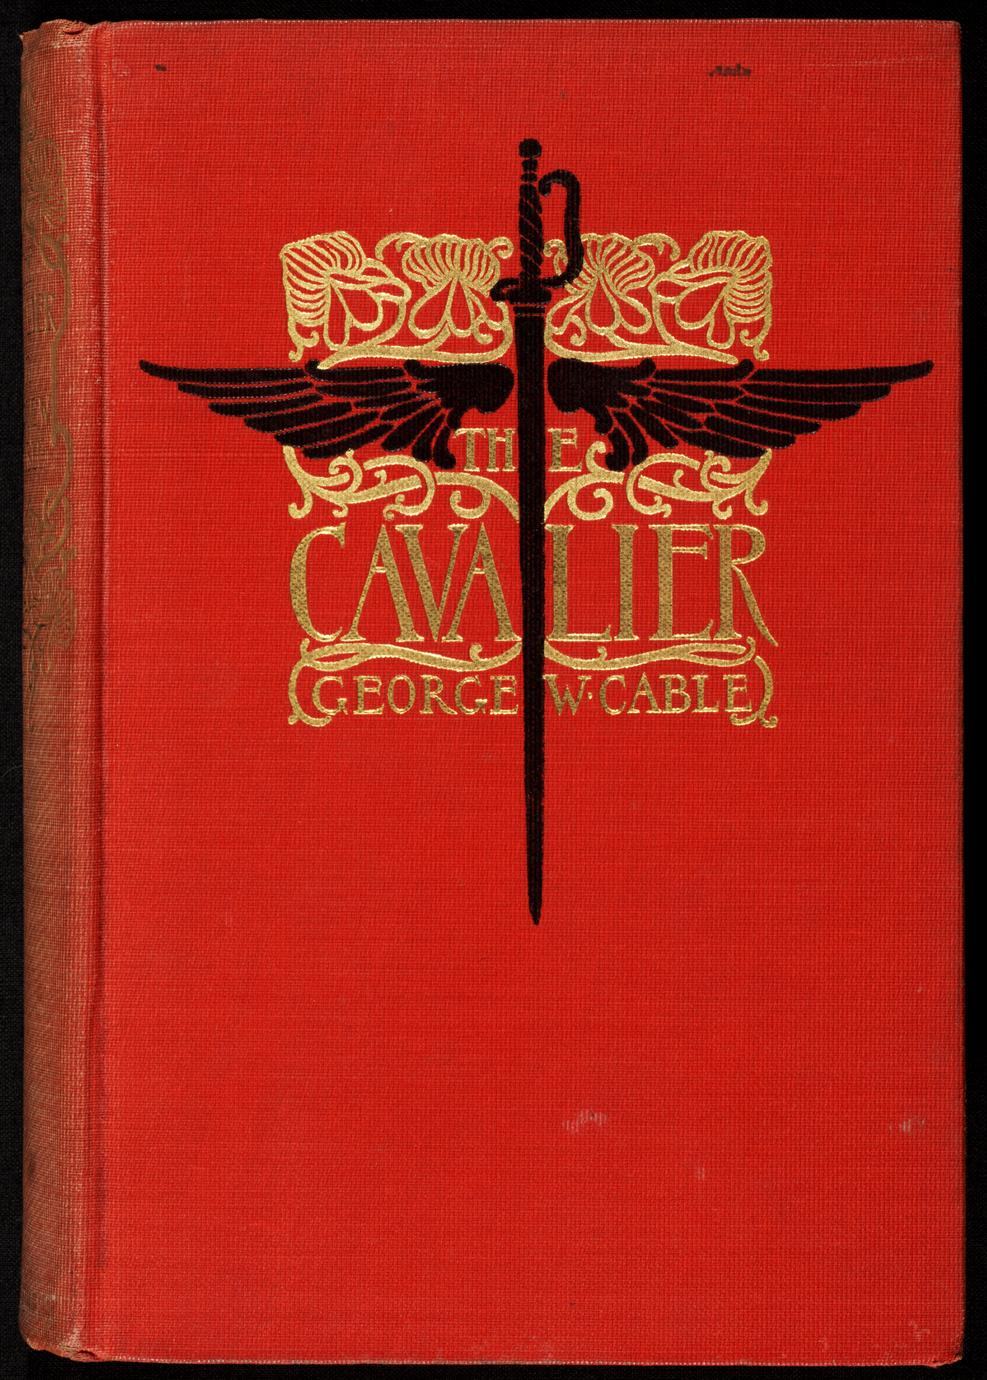 Cavalier (1 of 2)